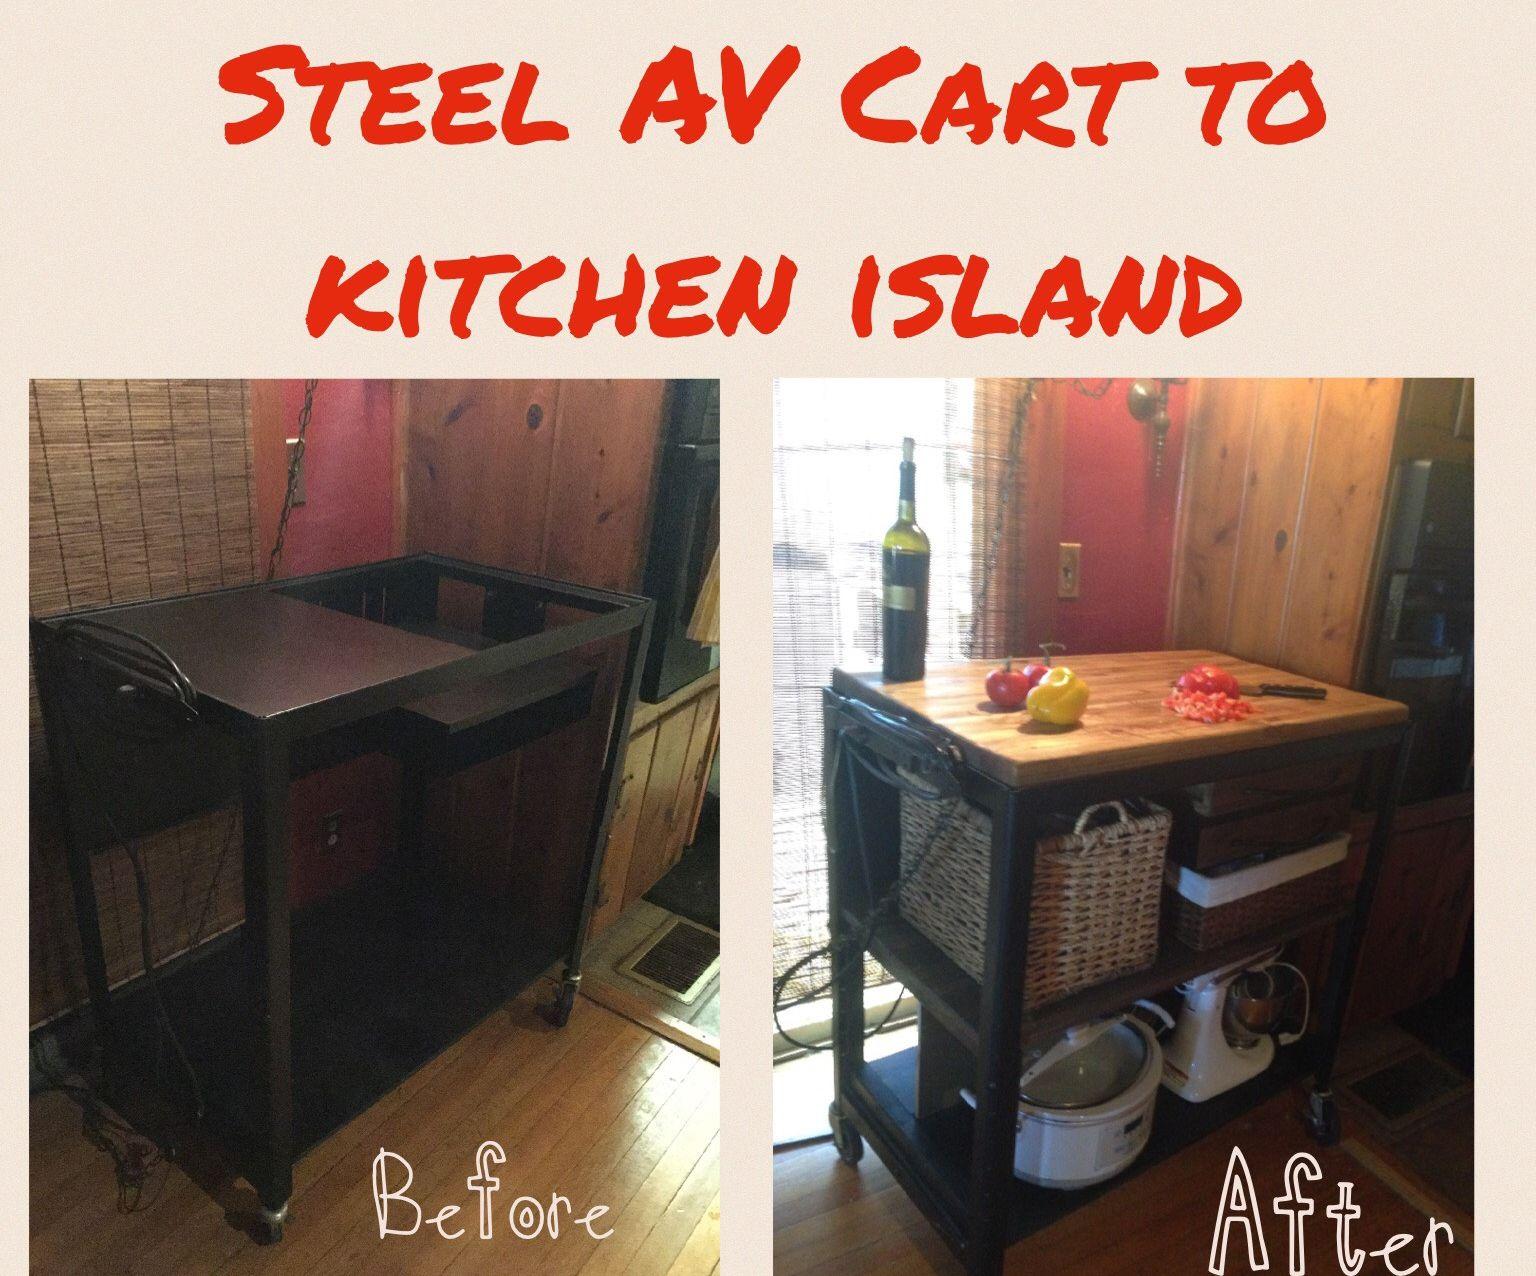 Steel AV Cart Repurposed to Kitchen Storage Island